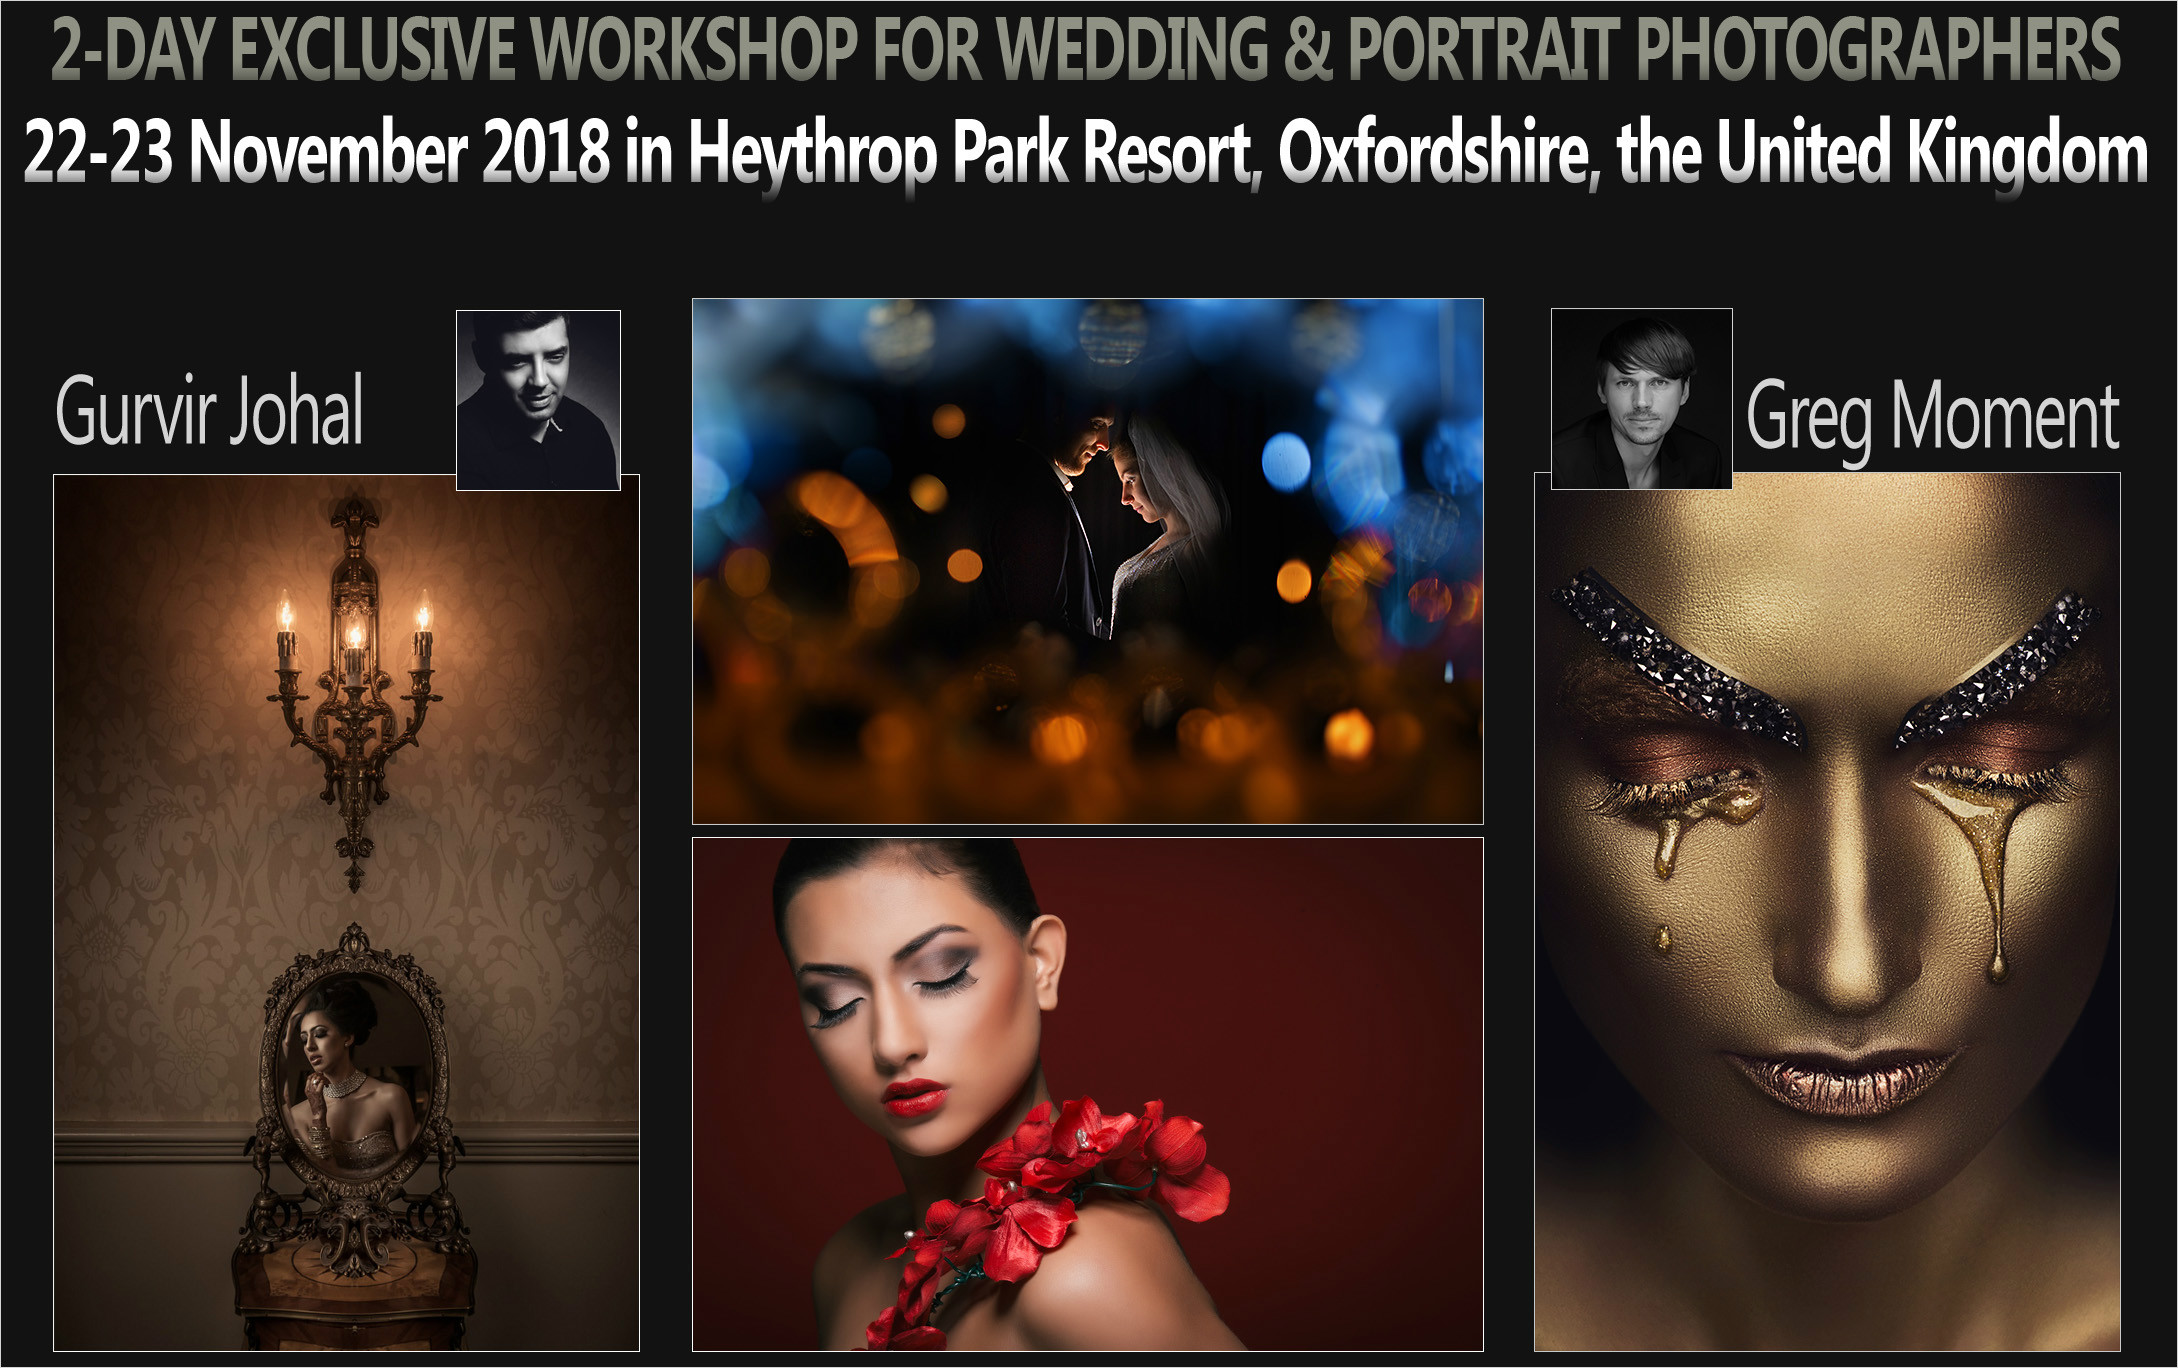 Heythrop Park Resort, Oxfordshire, UK - 22/23.11.2018. with Gurvir Johal